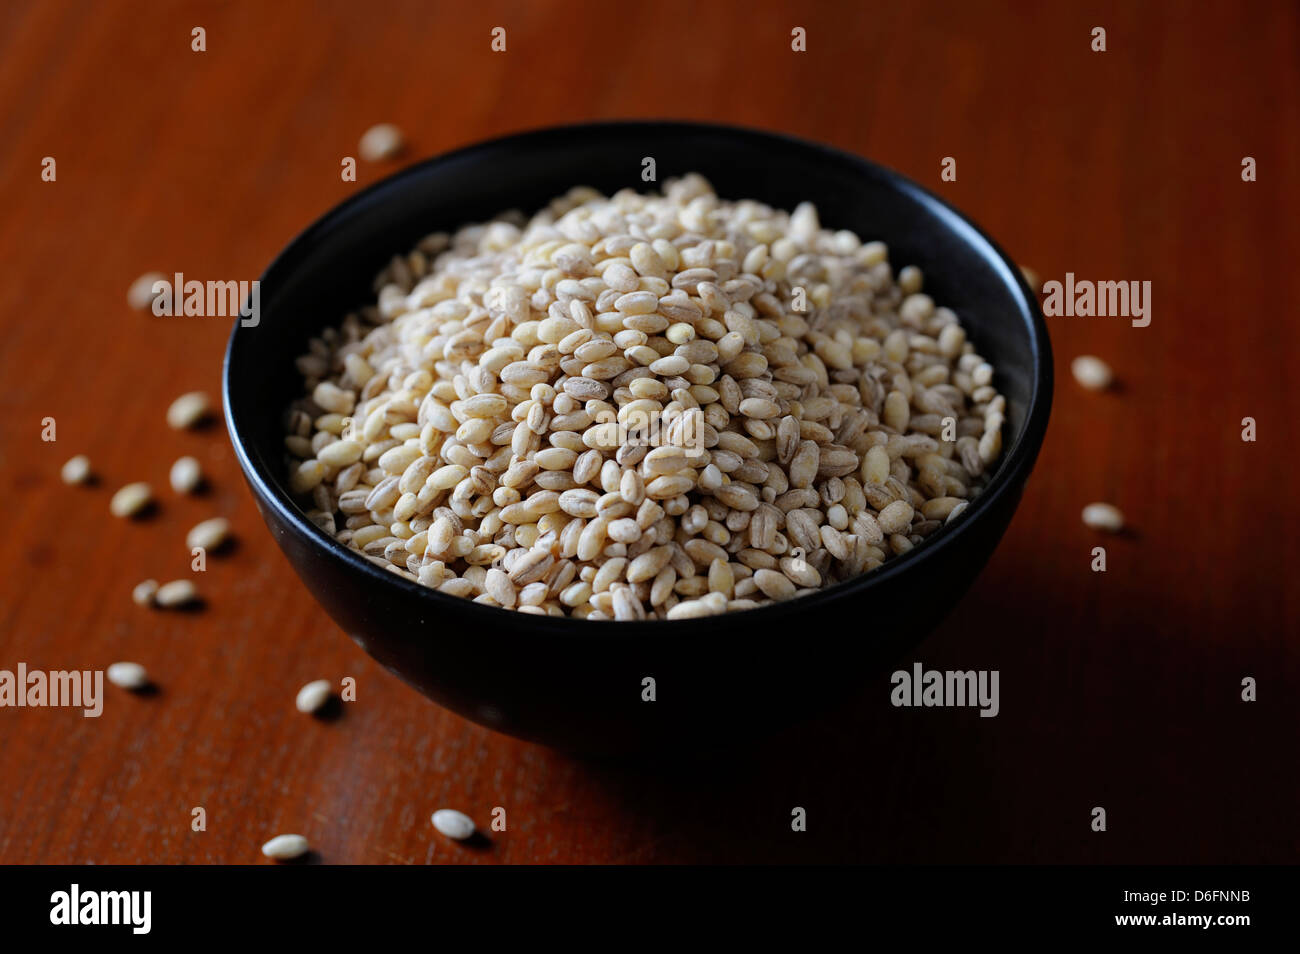 Pearl Barley - Stock Image